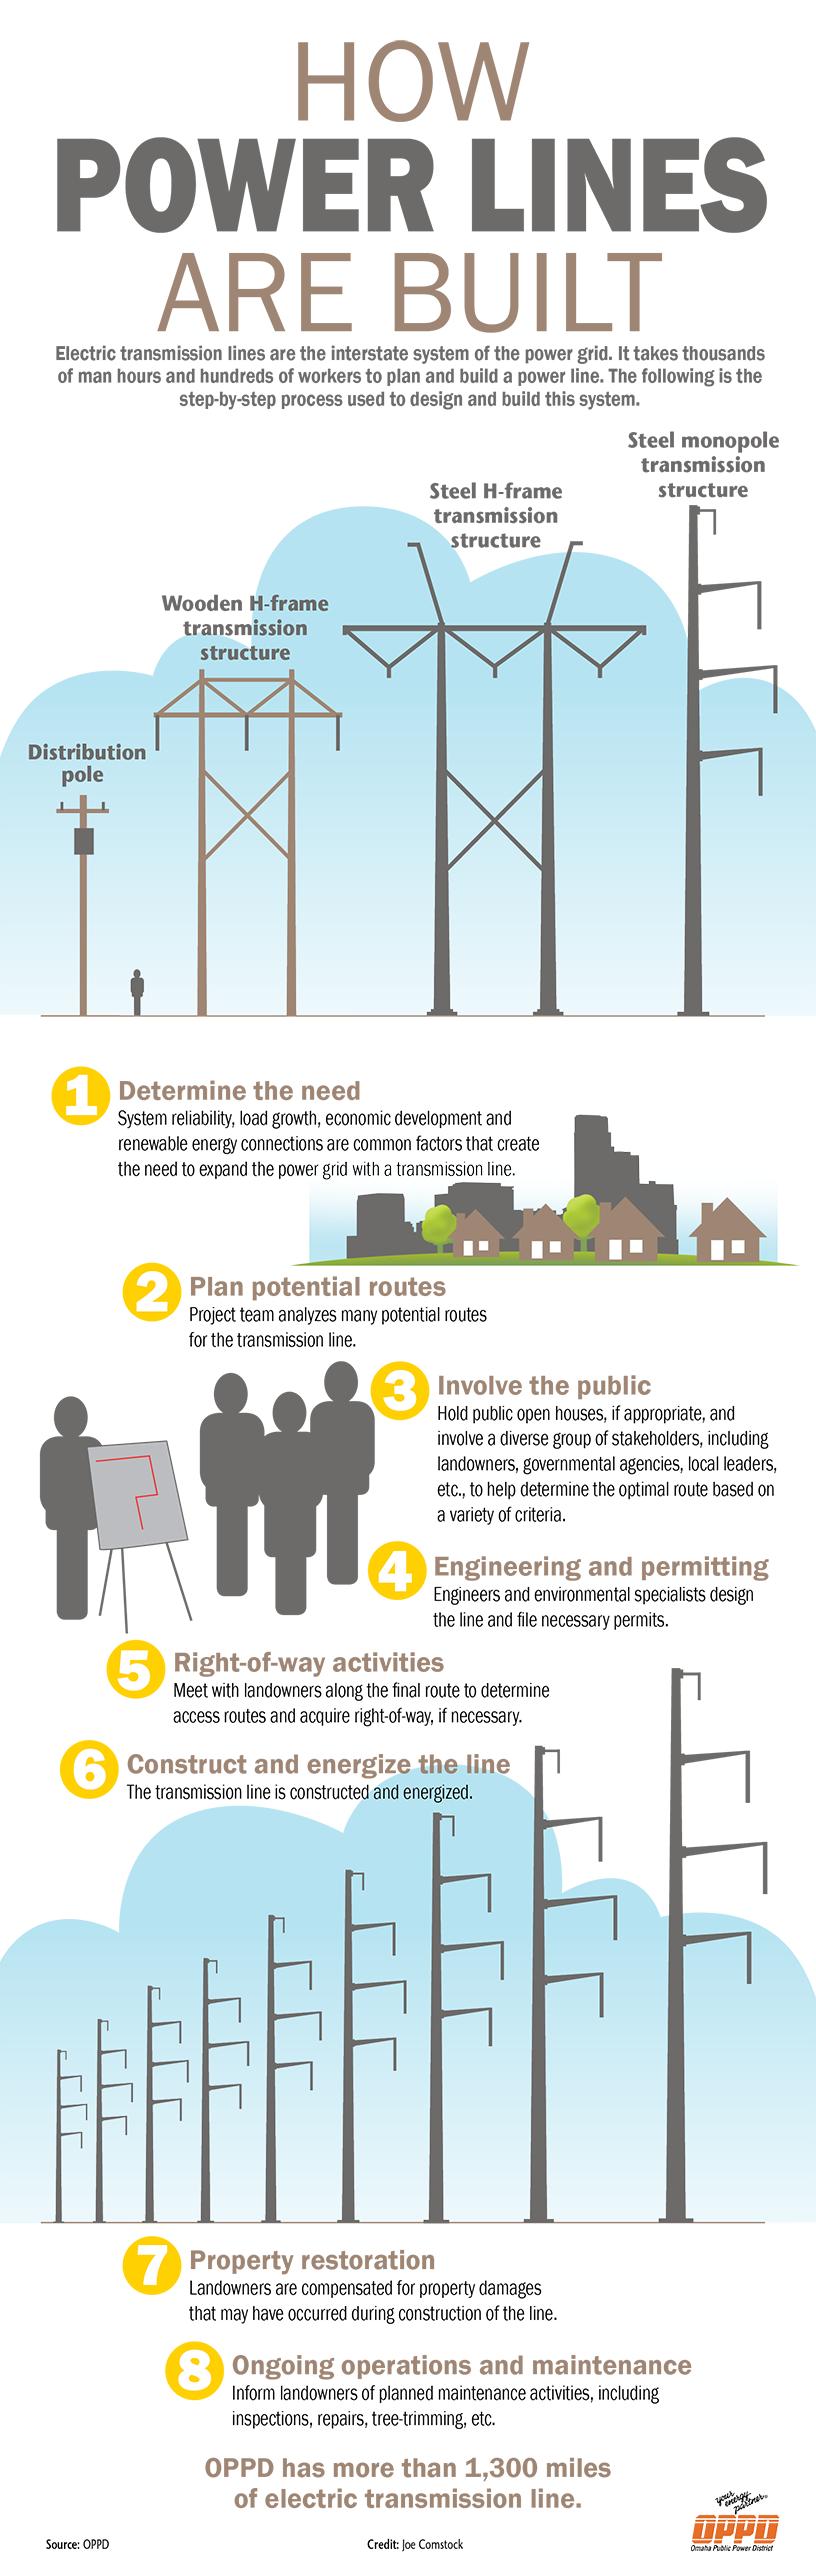 T&D_Power Line Process_infographic